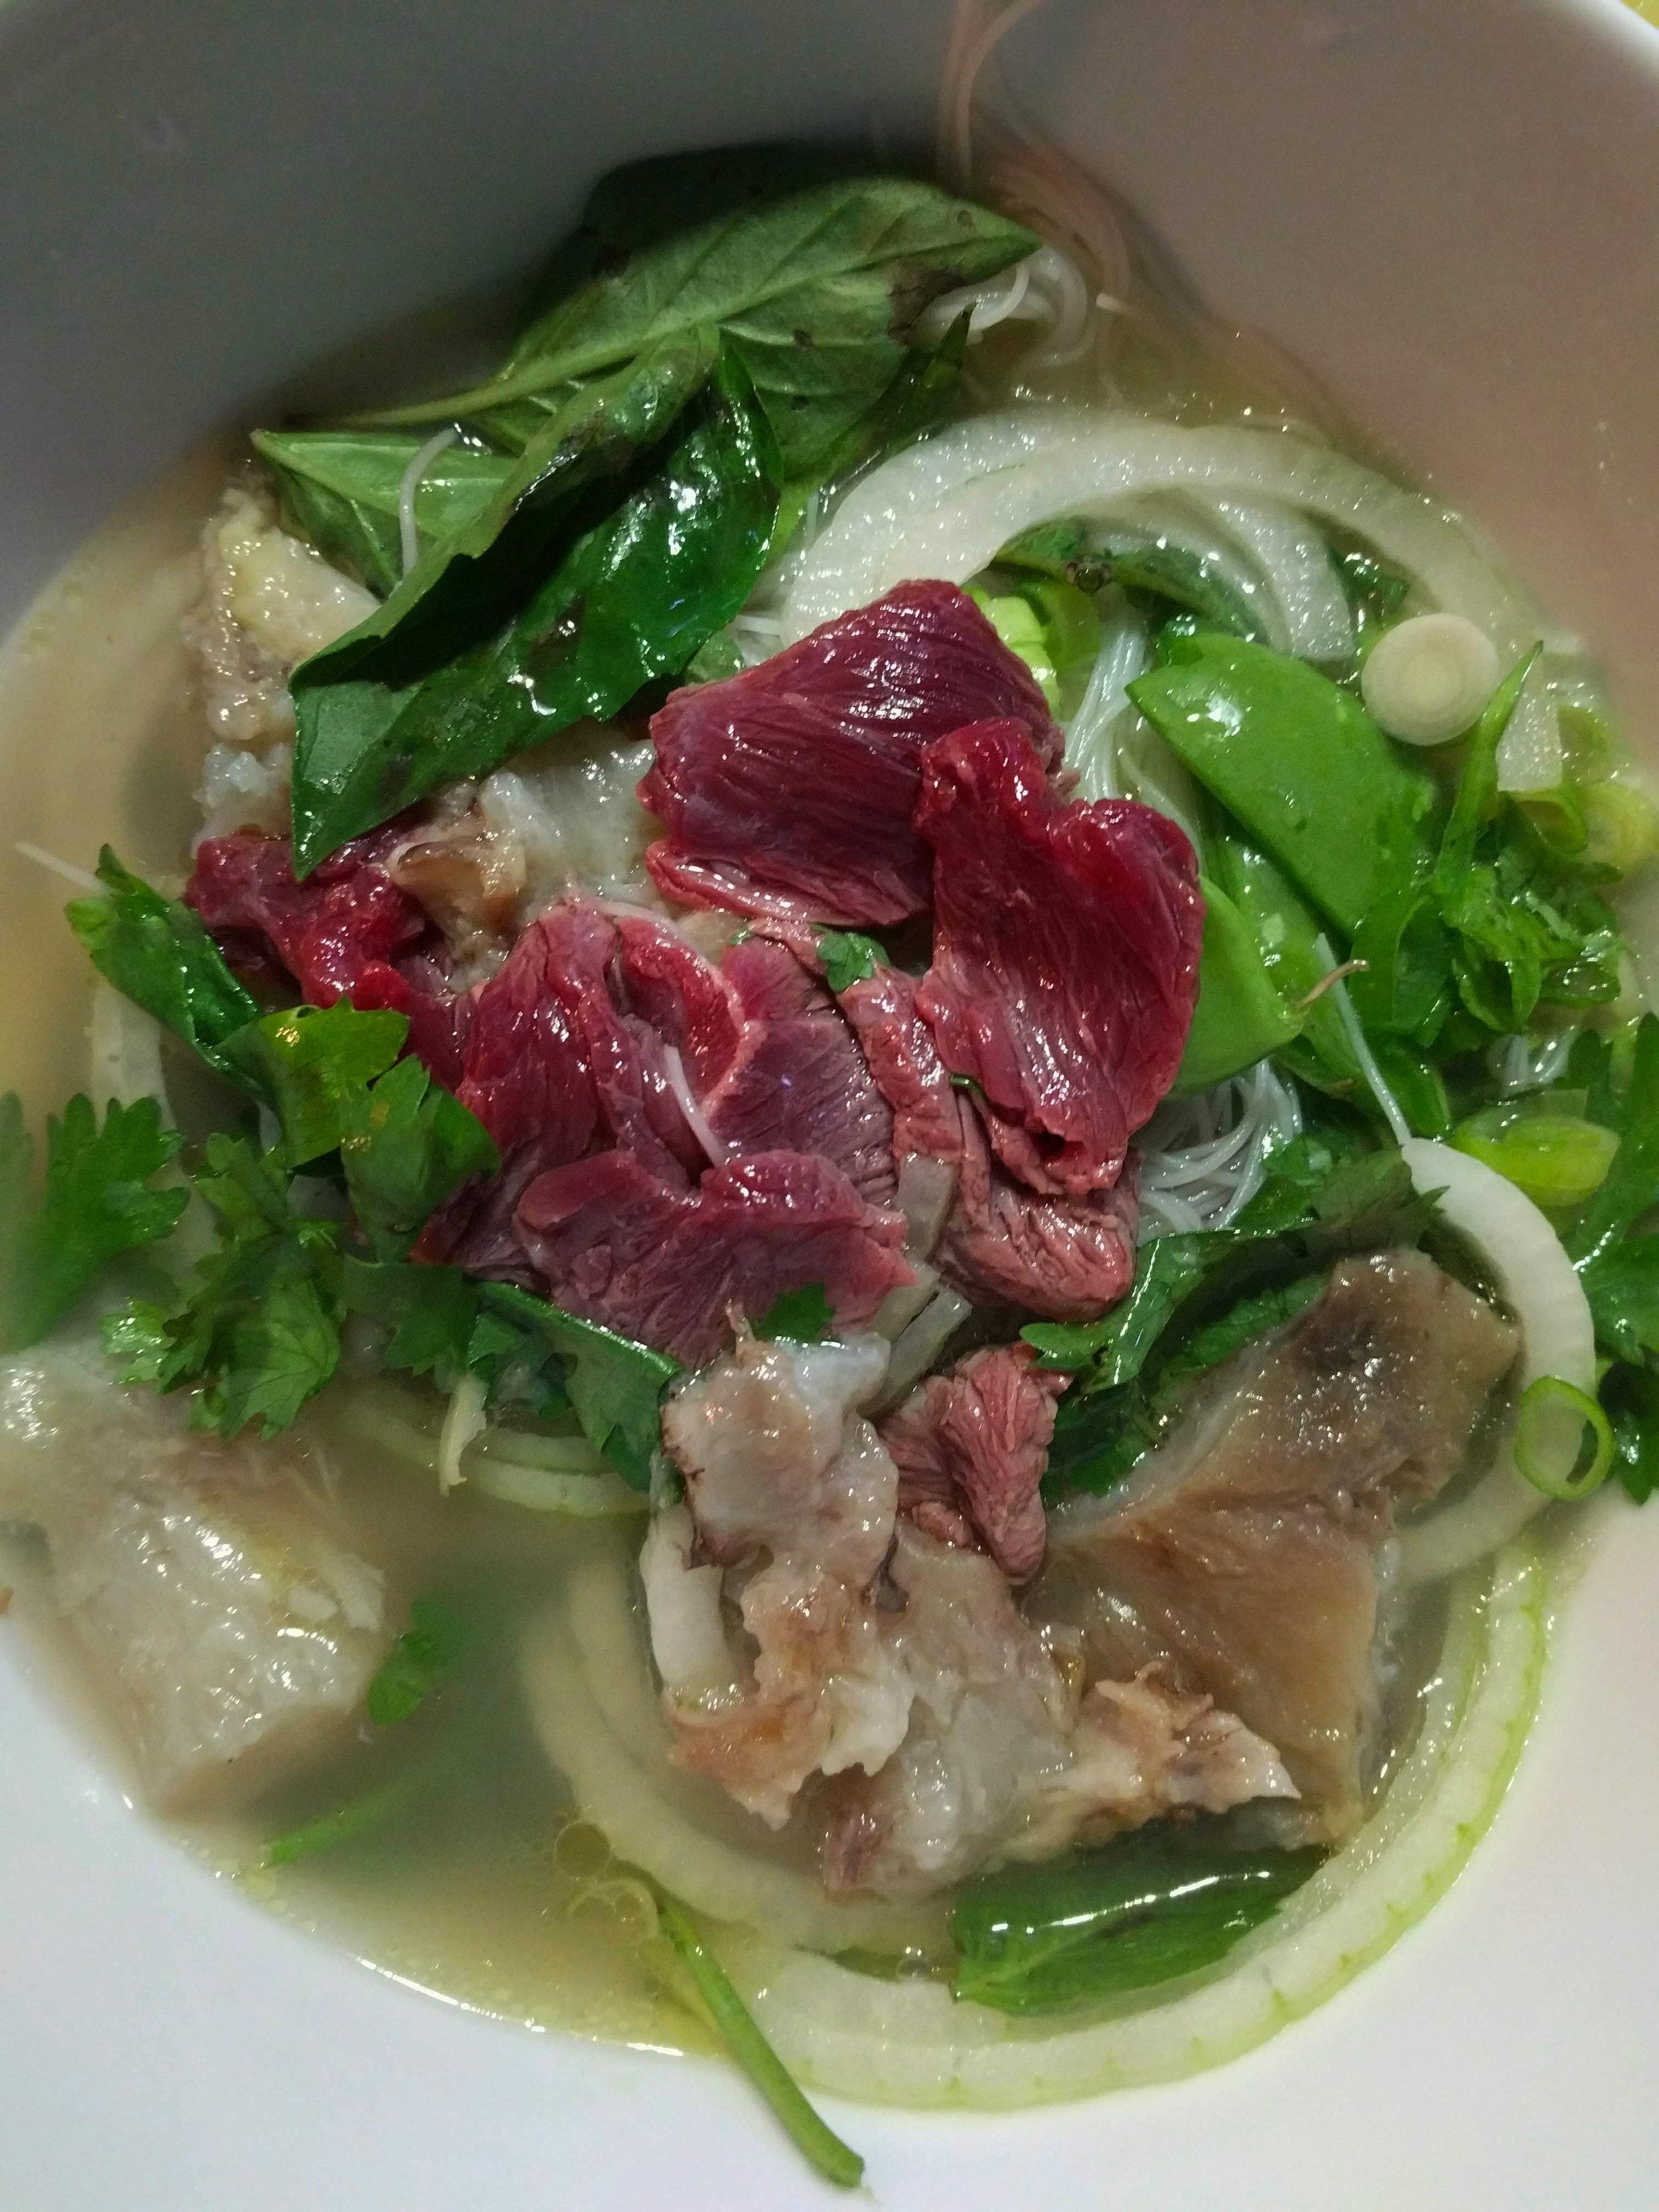 Recipes - Yak PhoYak Stir Fry